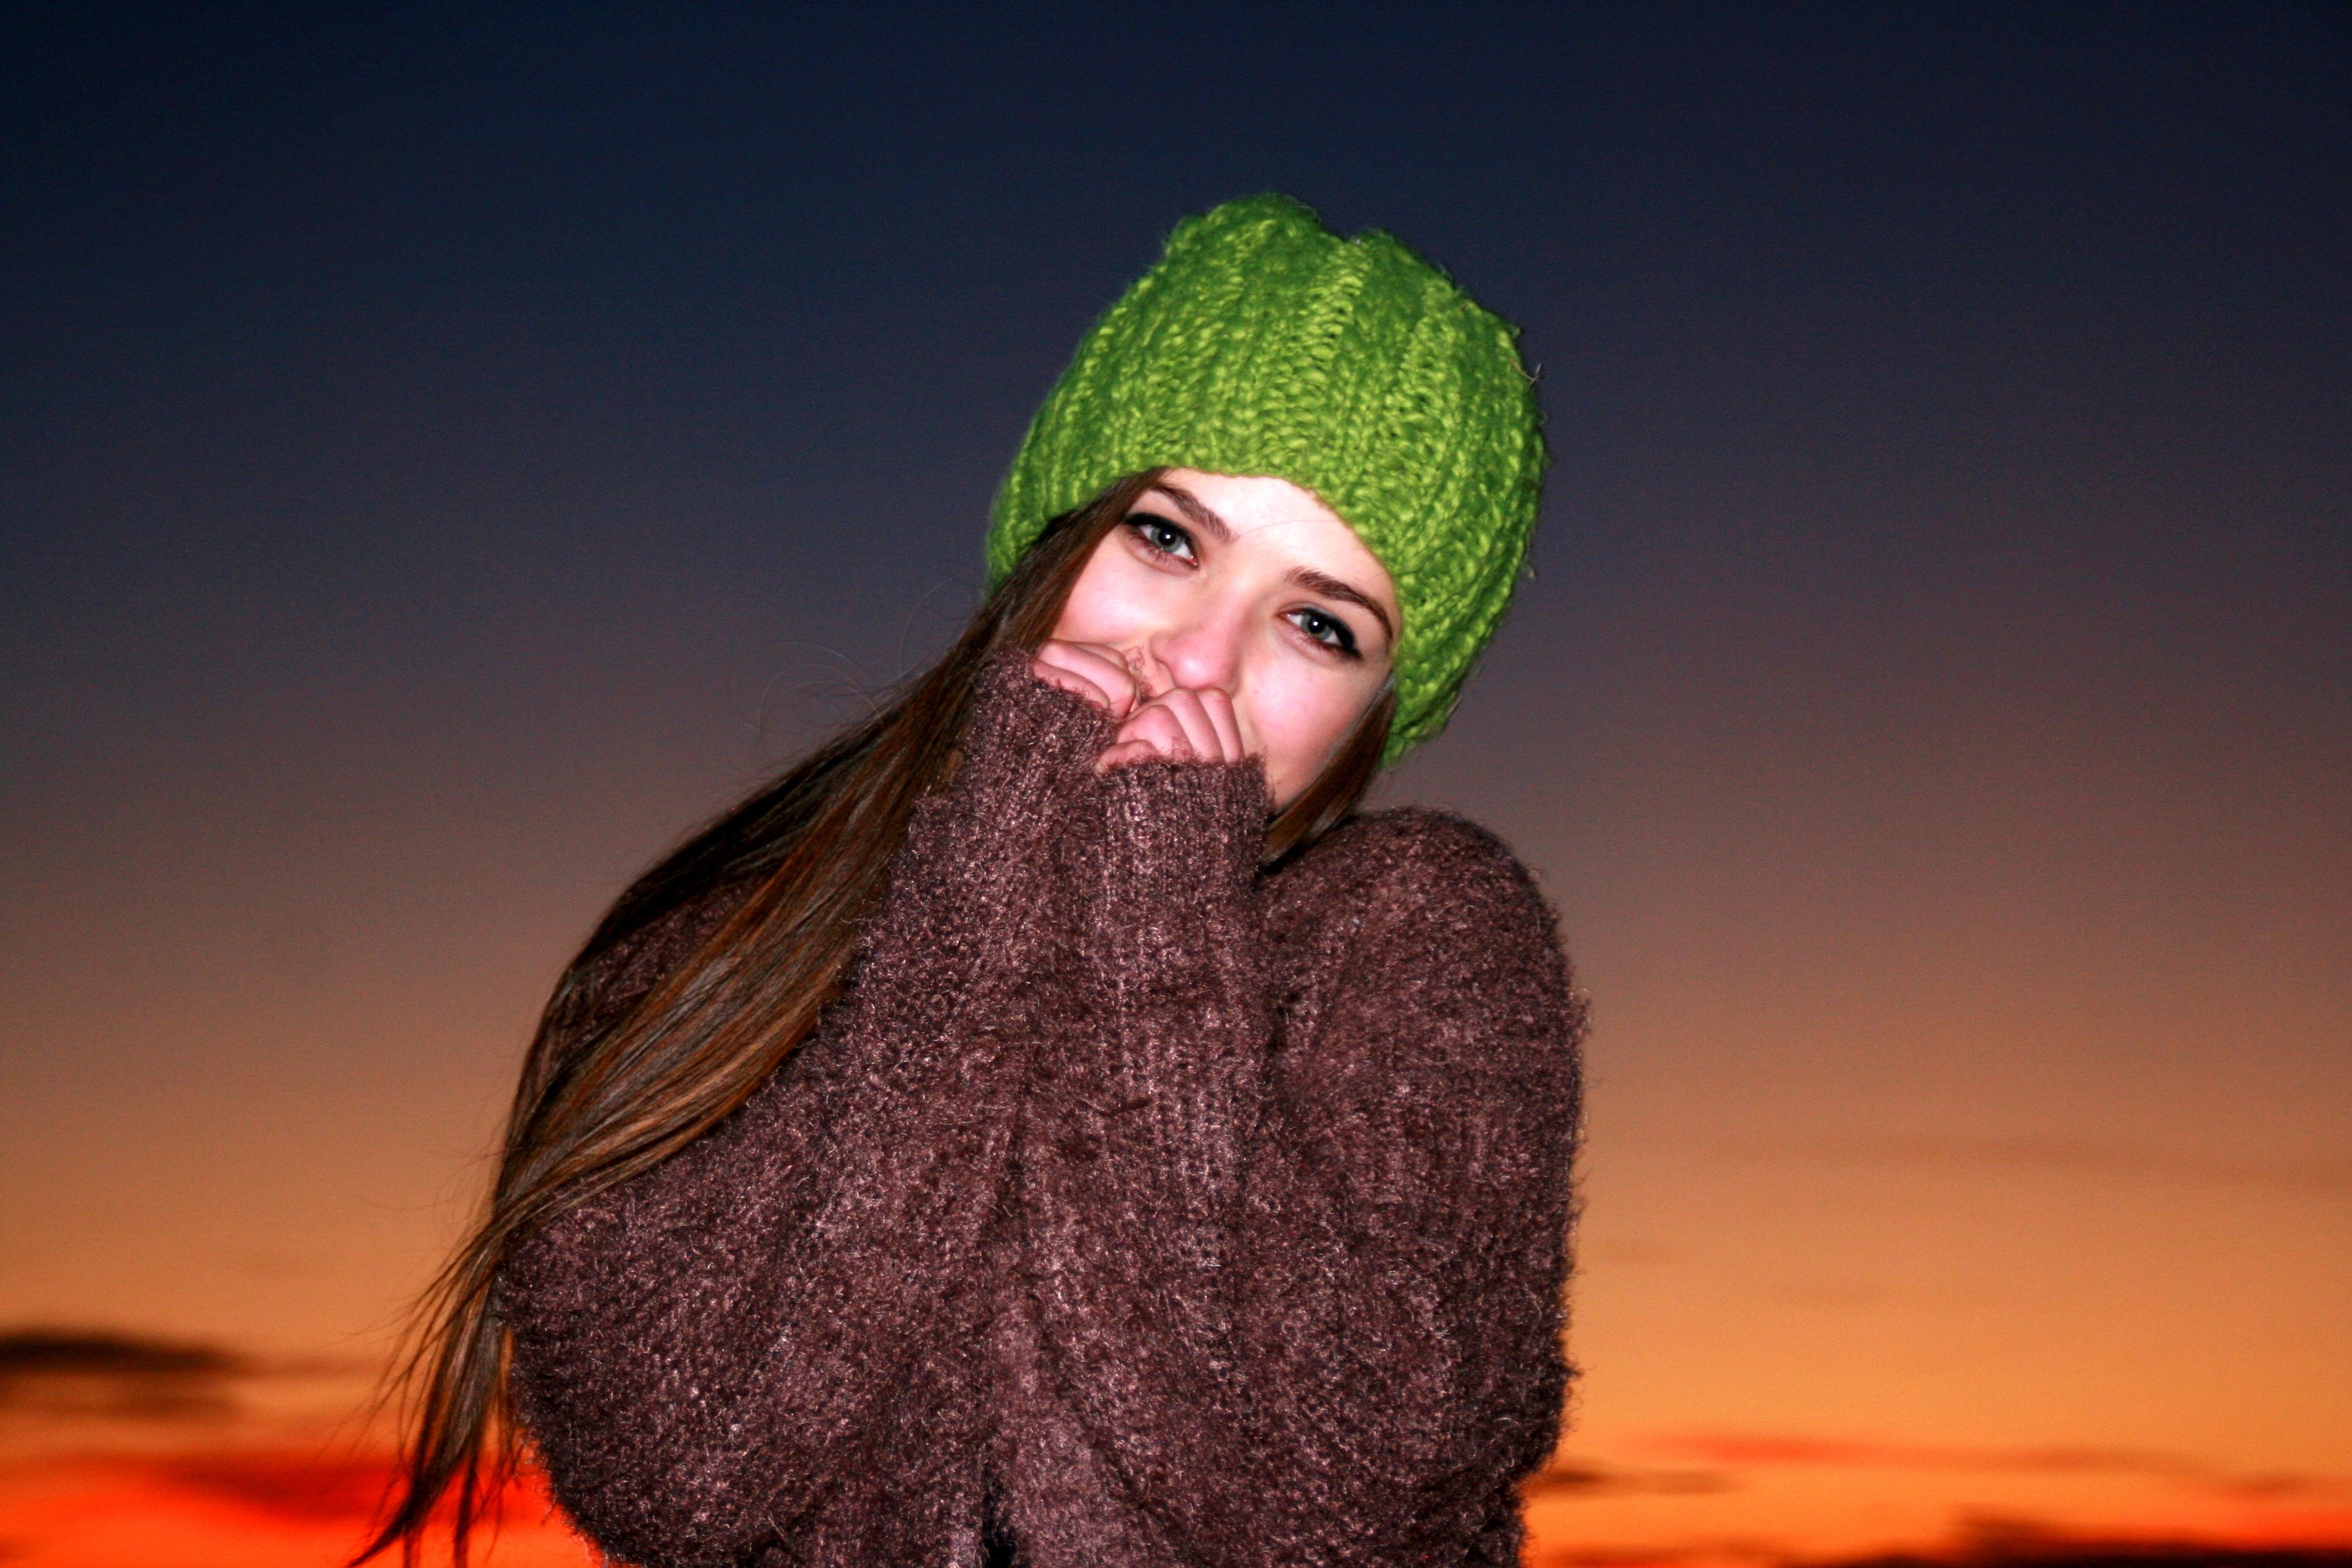 Kostenlose foto : kalt, Himmel, Mädchen, Haar, Sonnenuntergang ...